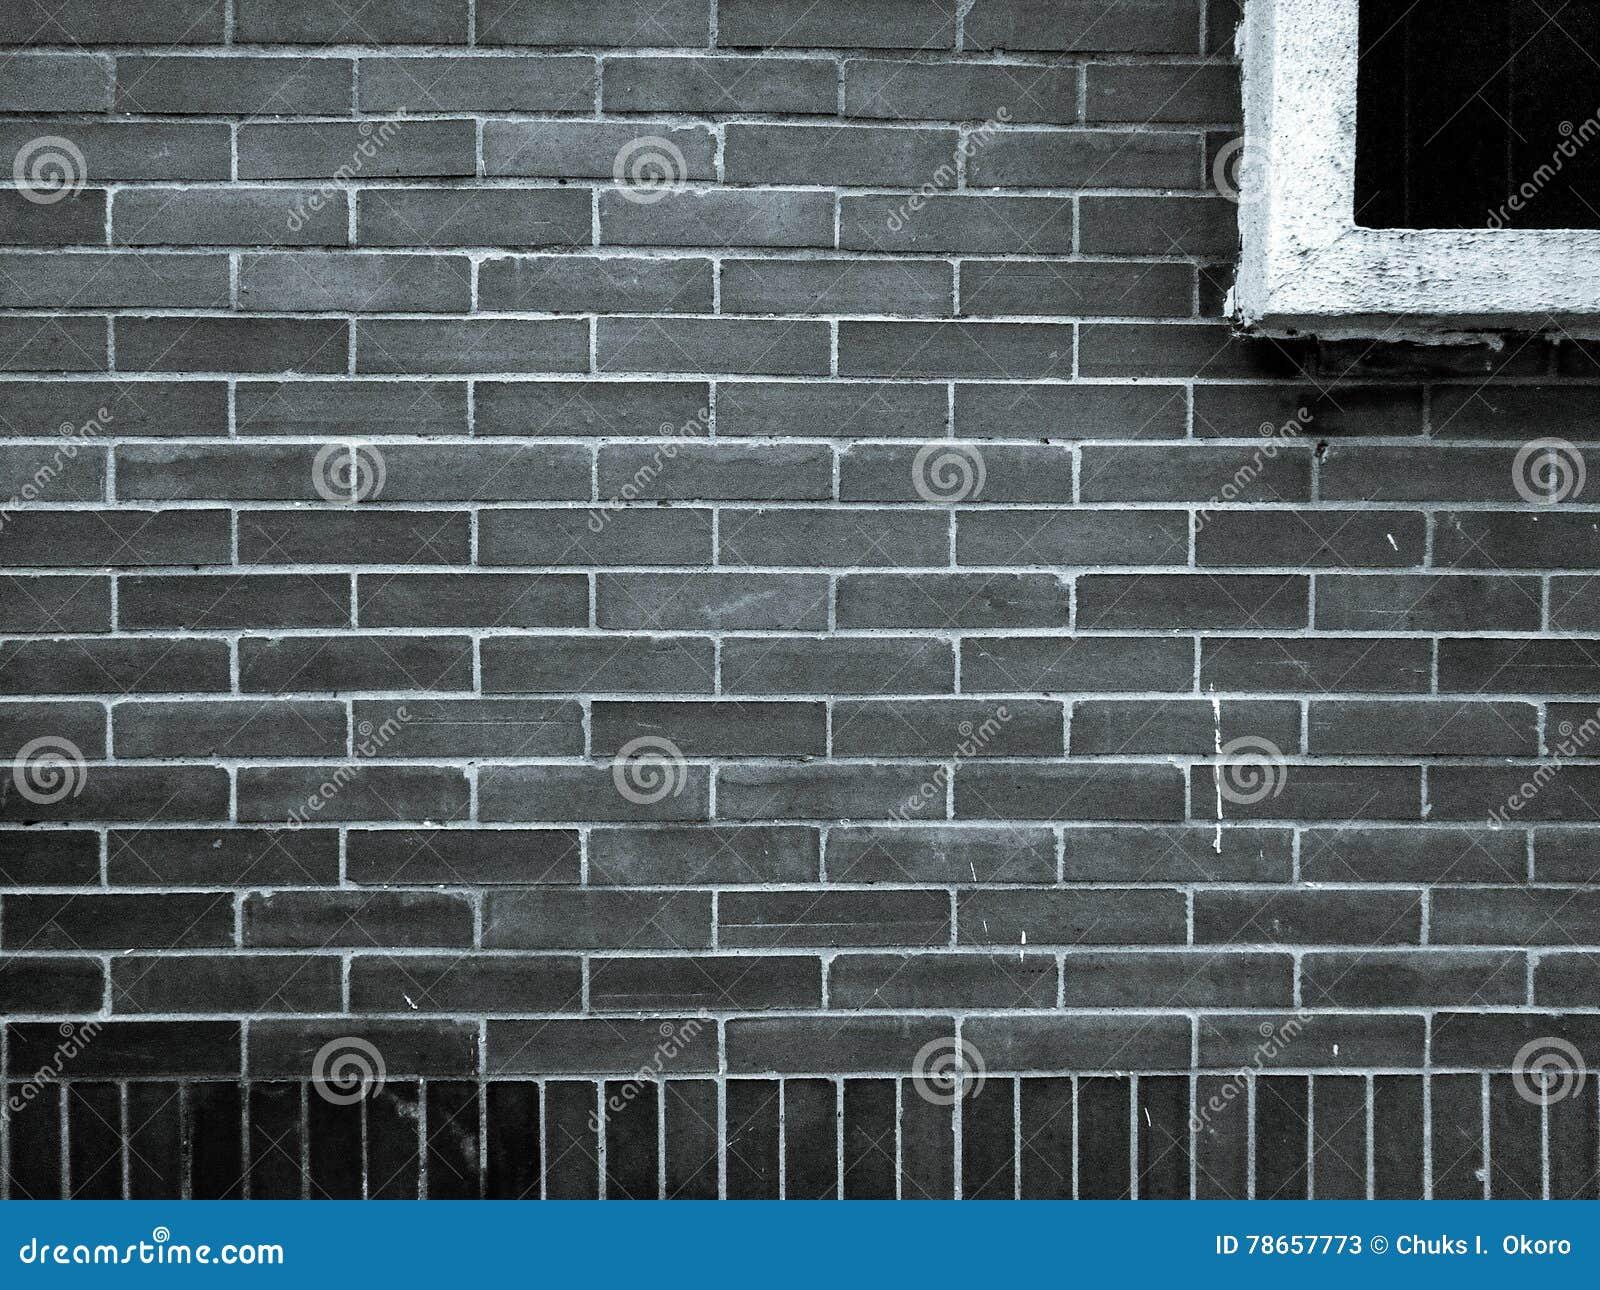 Burnt Clay Brick : Burnt clay brick wall stock photo image